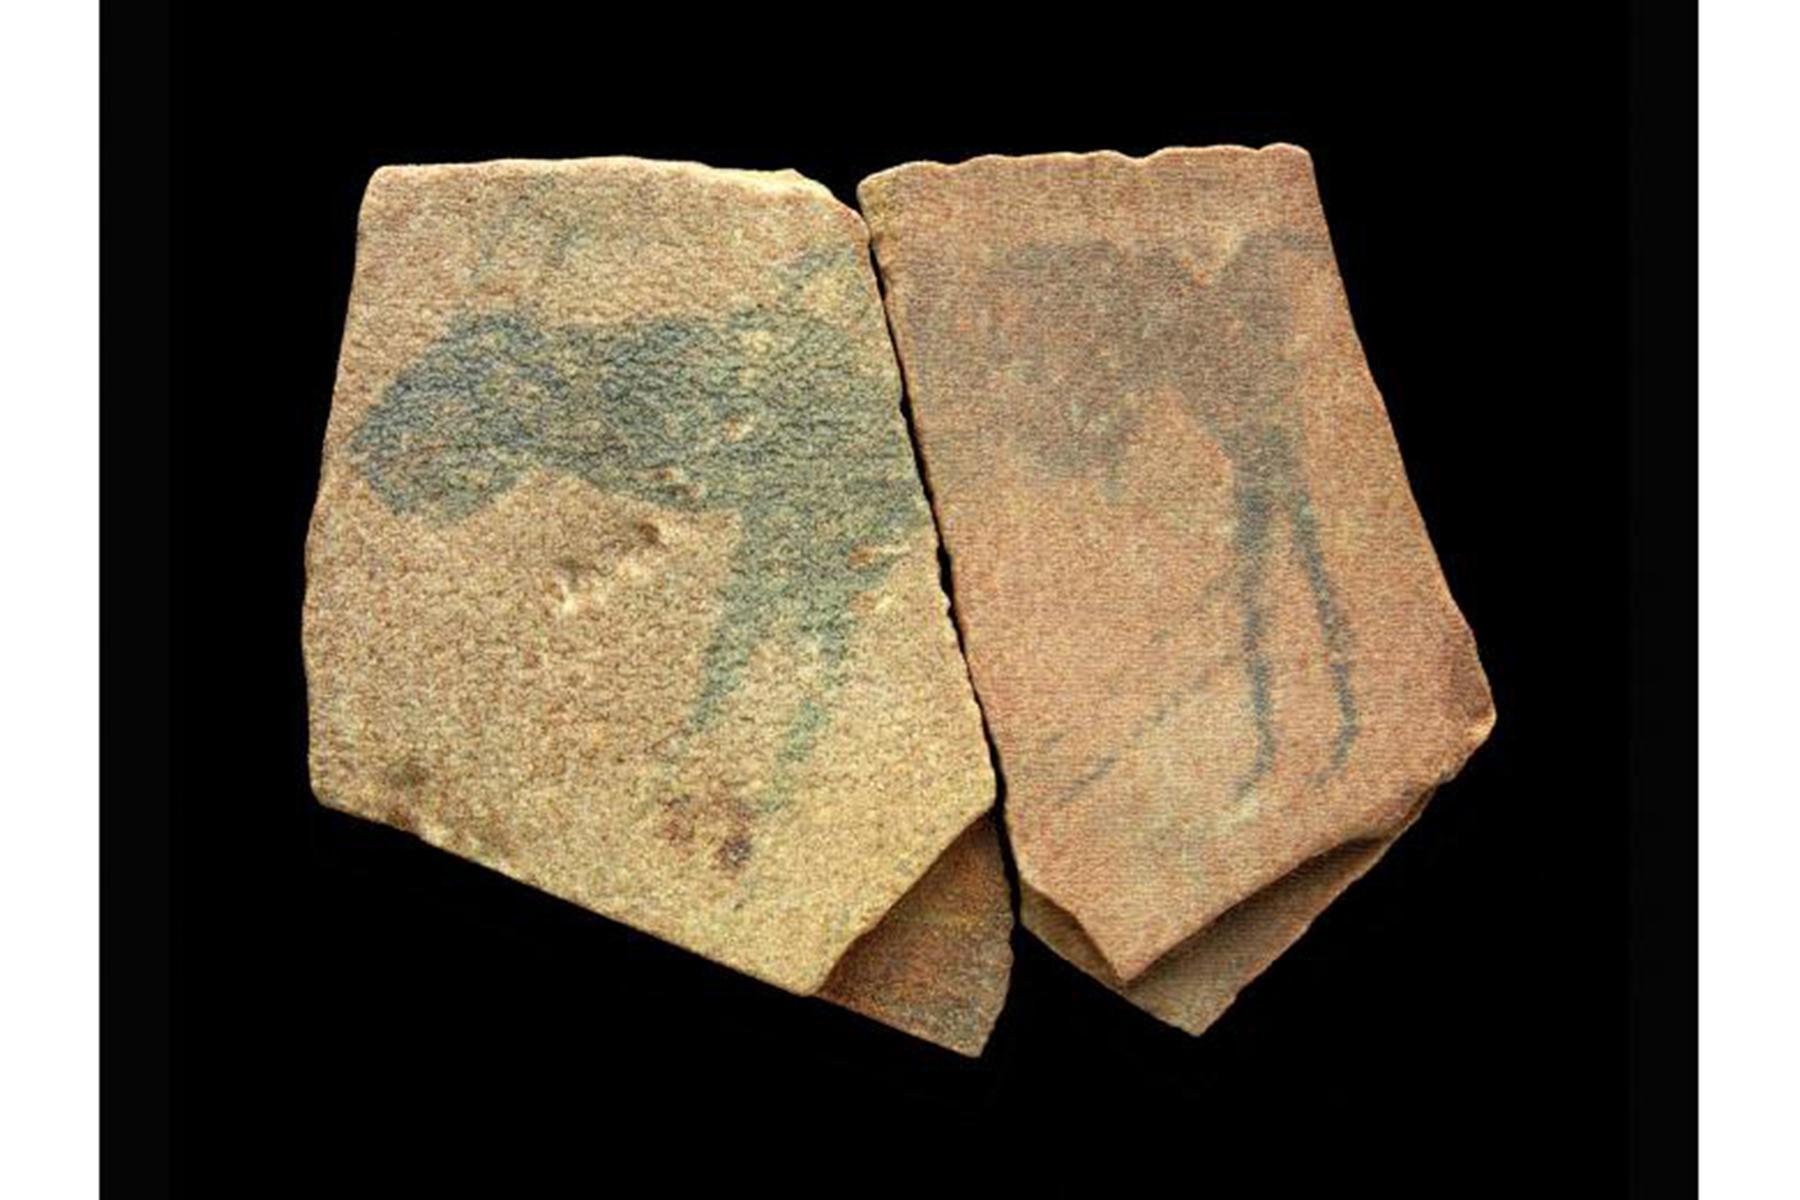 1_-_apollo_11_stones-14fe07cb1ad146c06bb